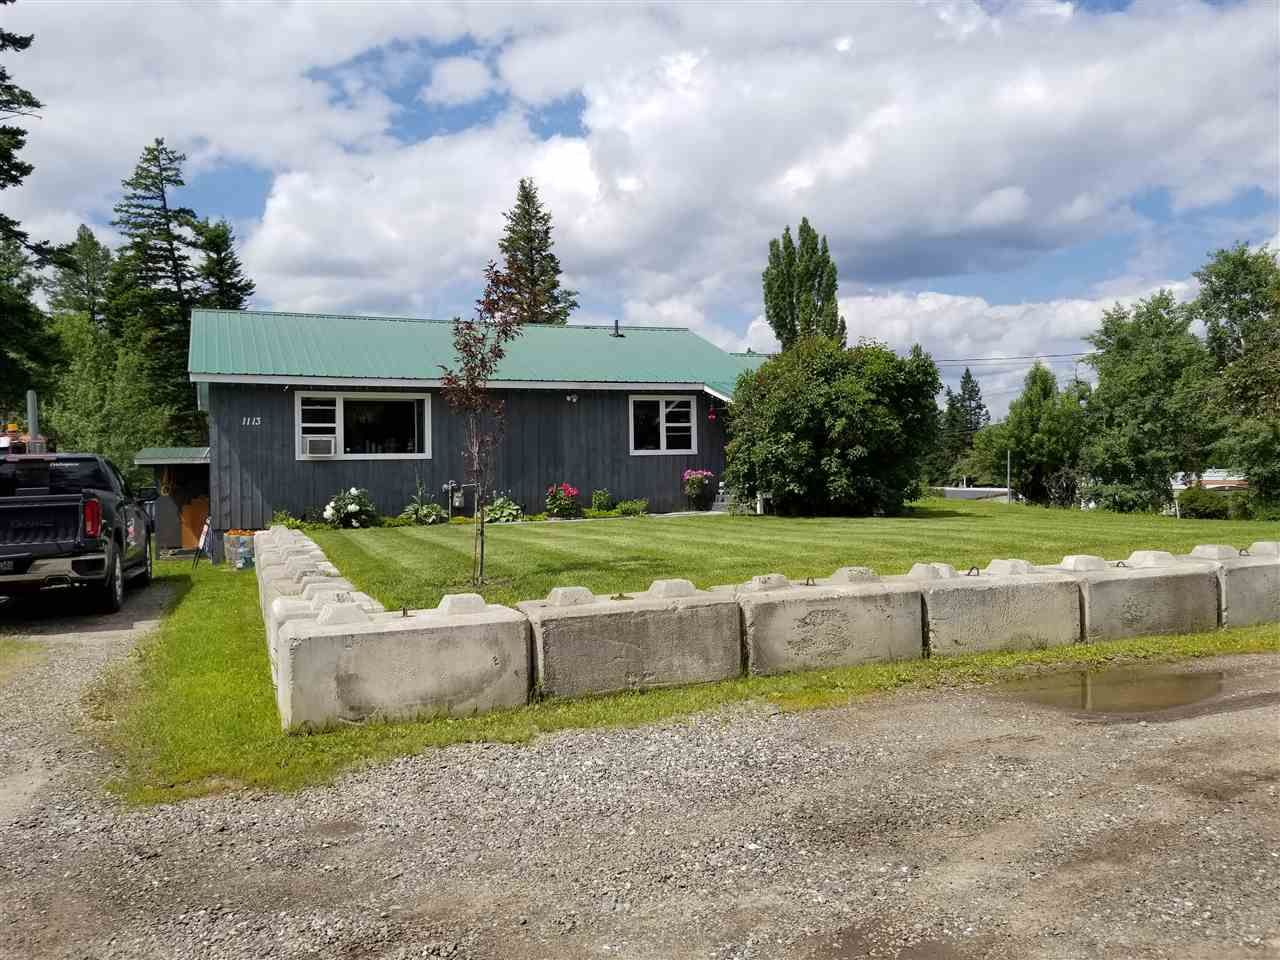 Main Photo: 1113 DOG CREEK Road in Williams Lake: Esler/Dog Creek House for sale (Williams Lake (Zone 27))  : MLS®# R2472139